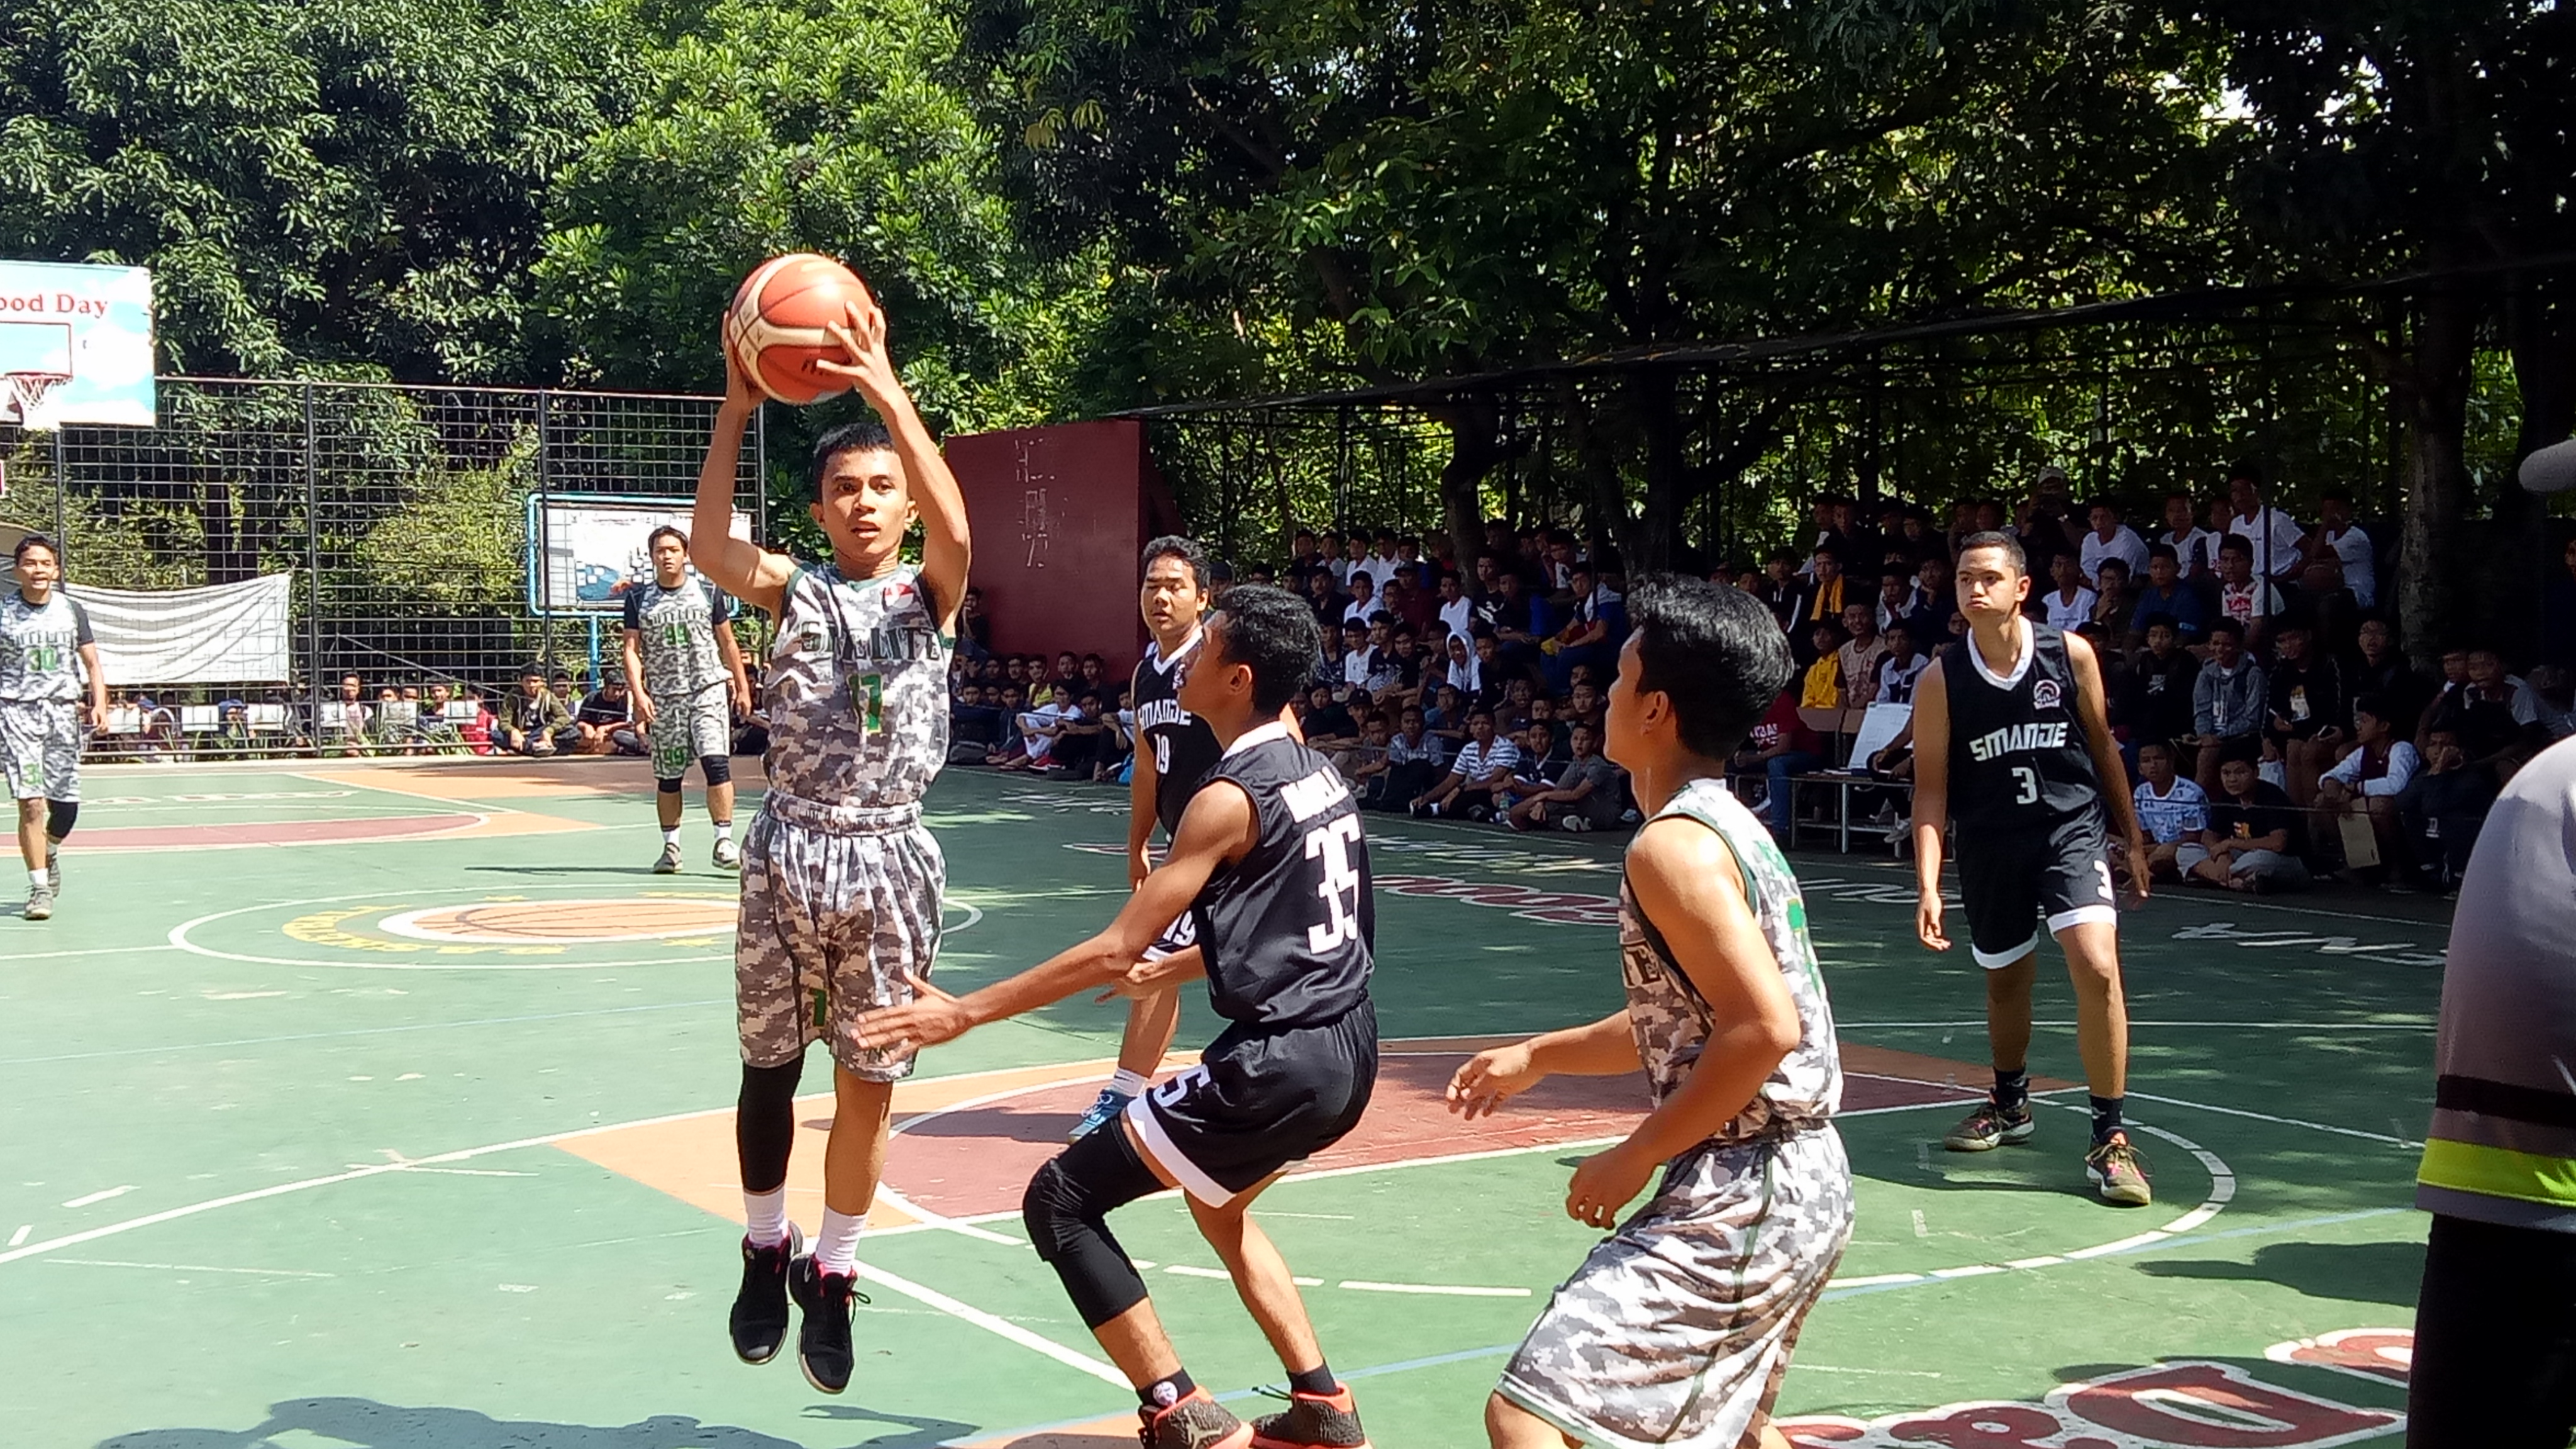 19 tim ikut turnamen basket Libas in action di SMAN 5 Depok